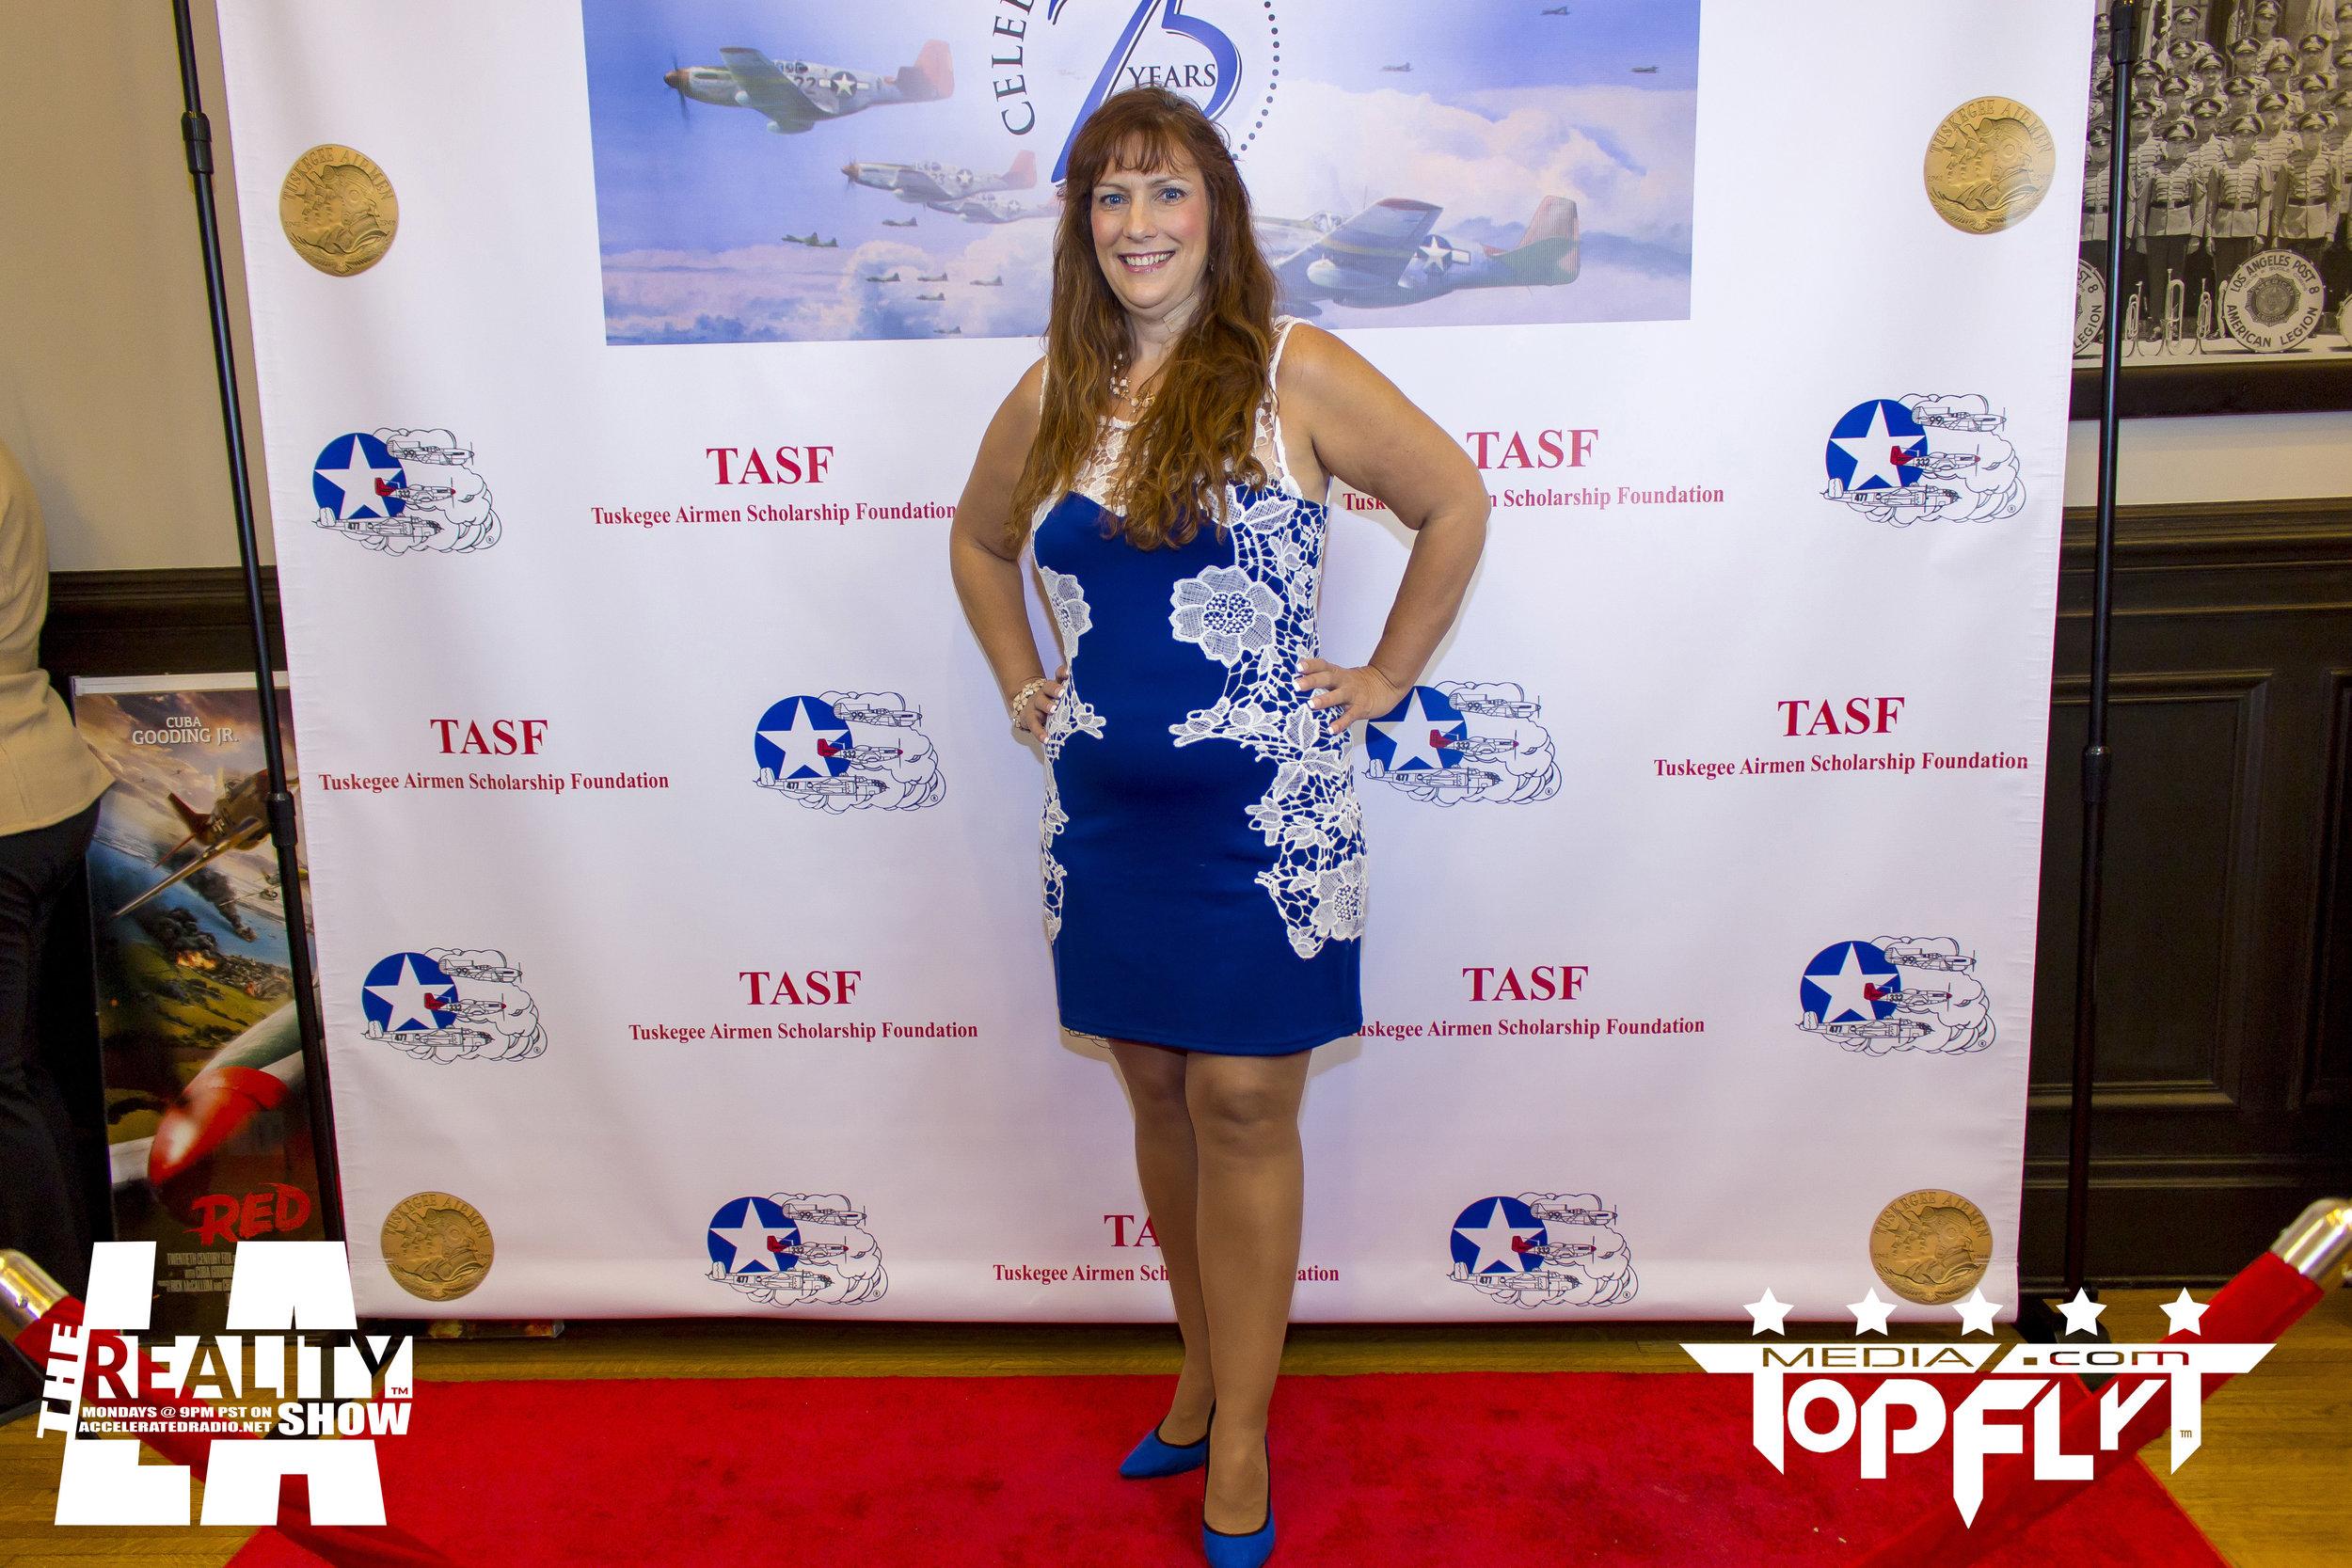 The Reality Show LA - Tuskegee Airmen 75th Anniversary VIP Reception_36.jpg